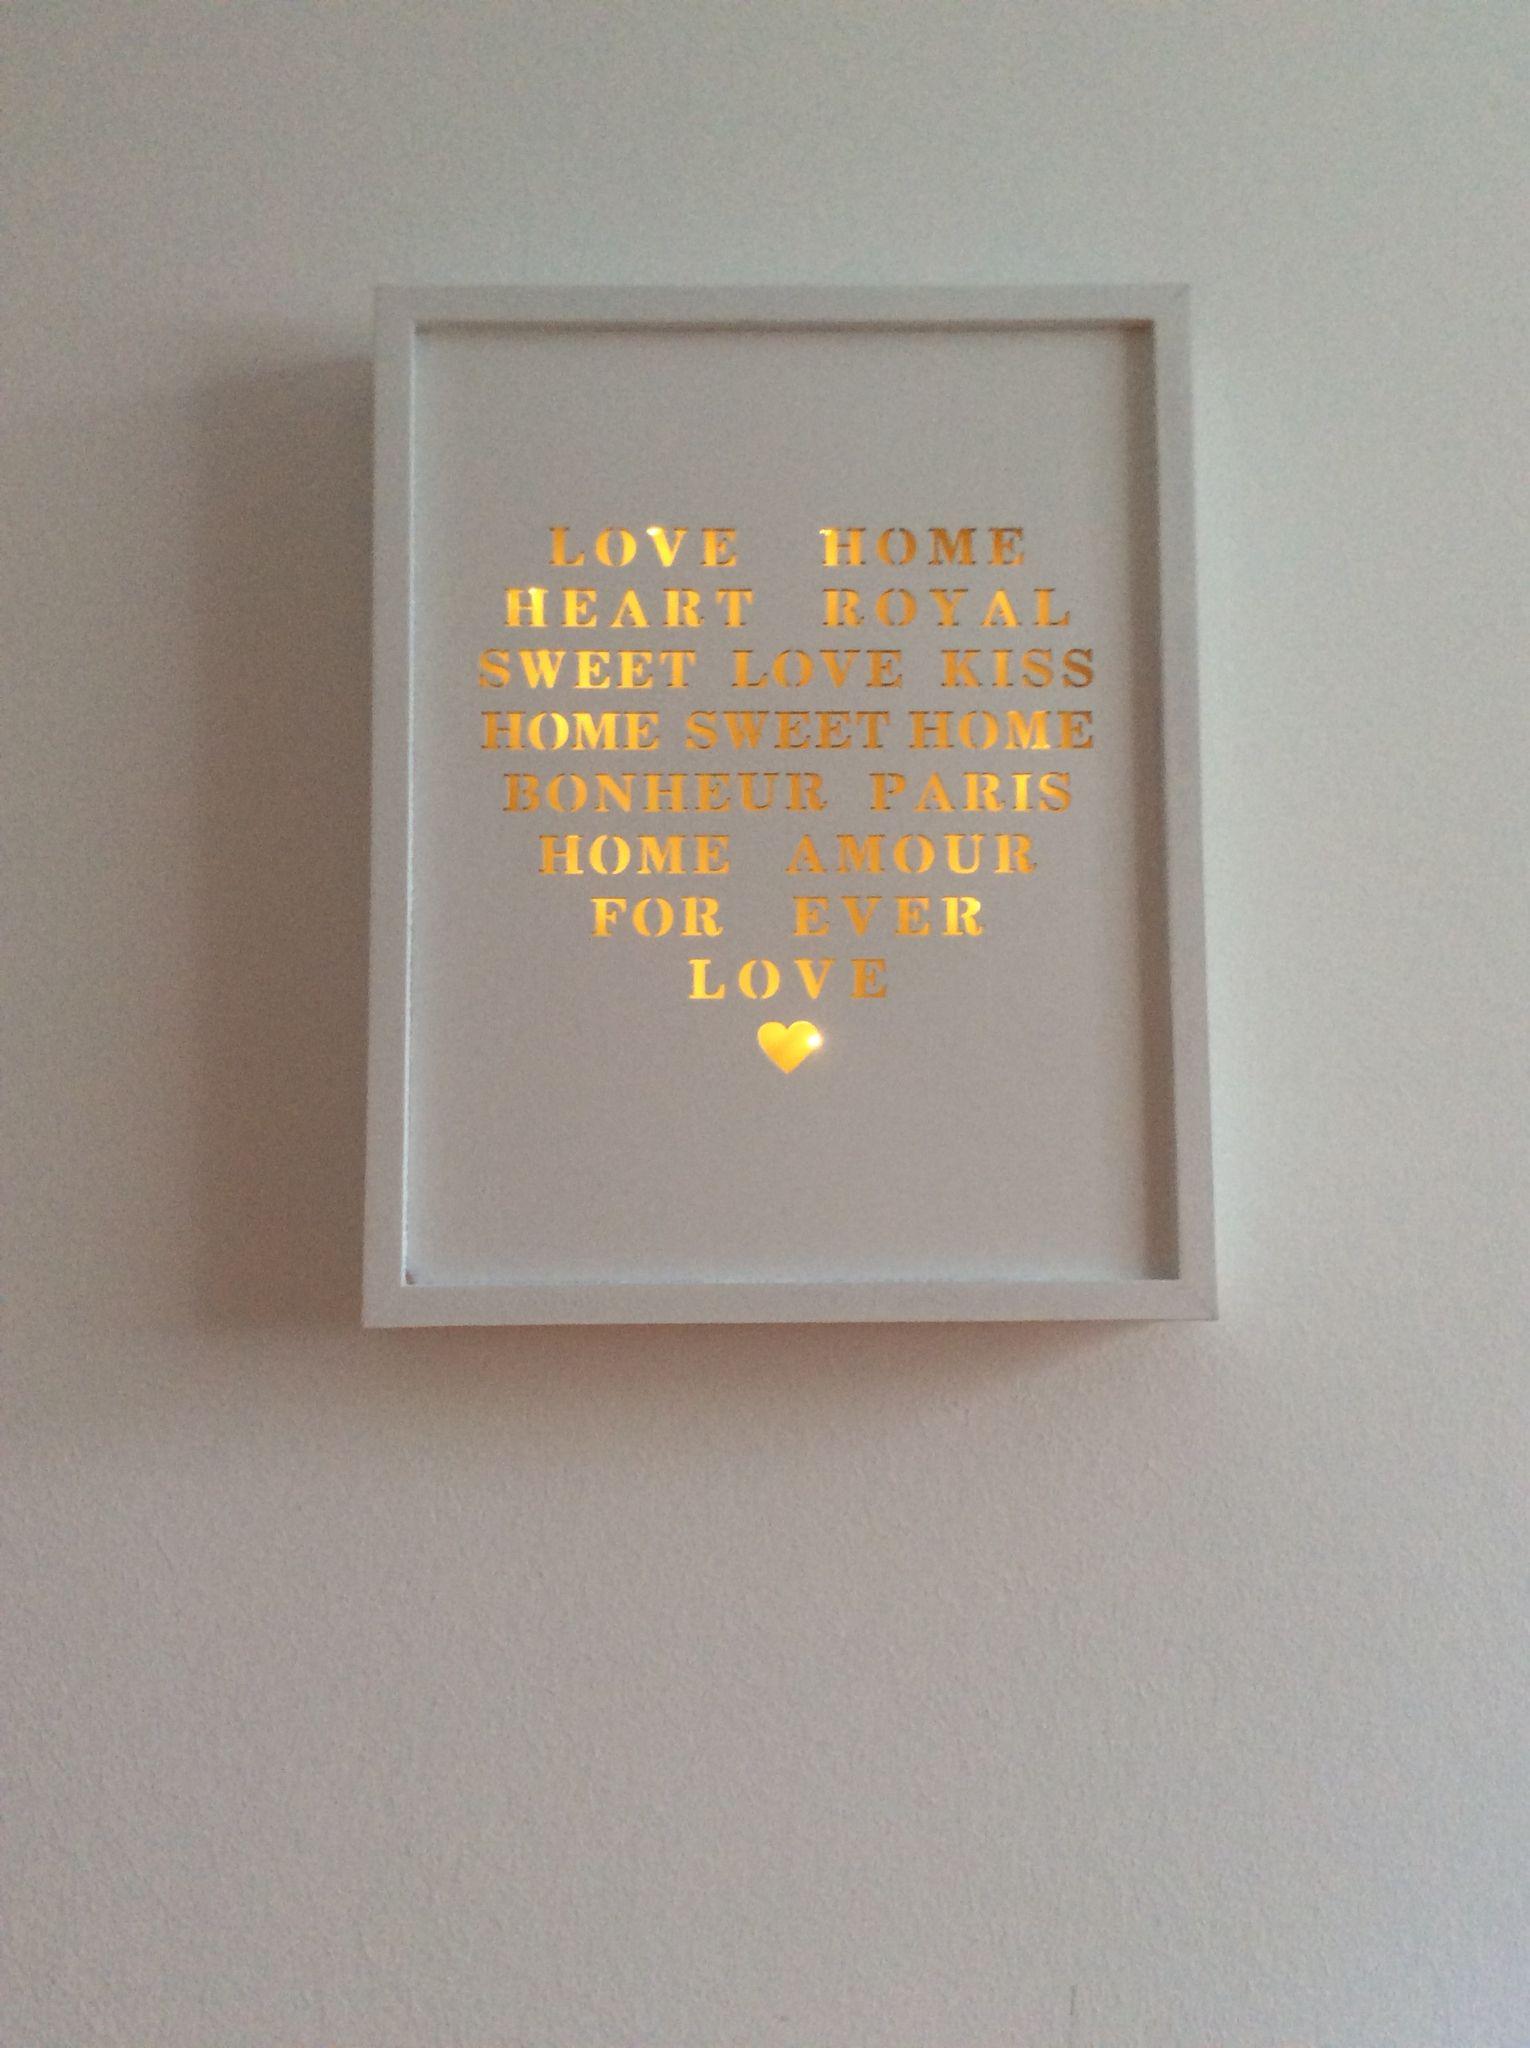 Rahmen beleuchtet | Light | Pinterest | Silhouettes, Shadow box and Box